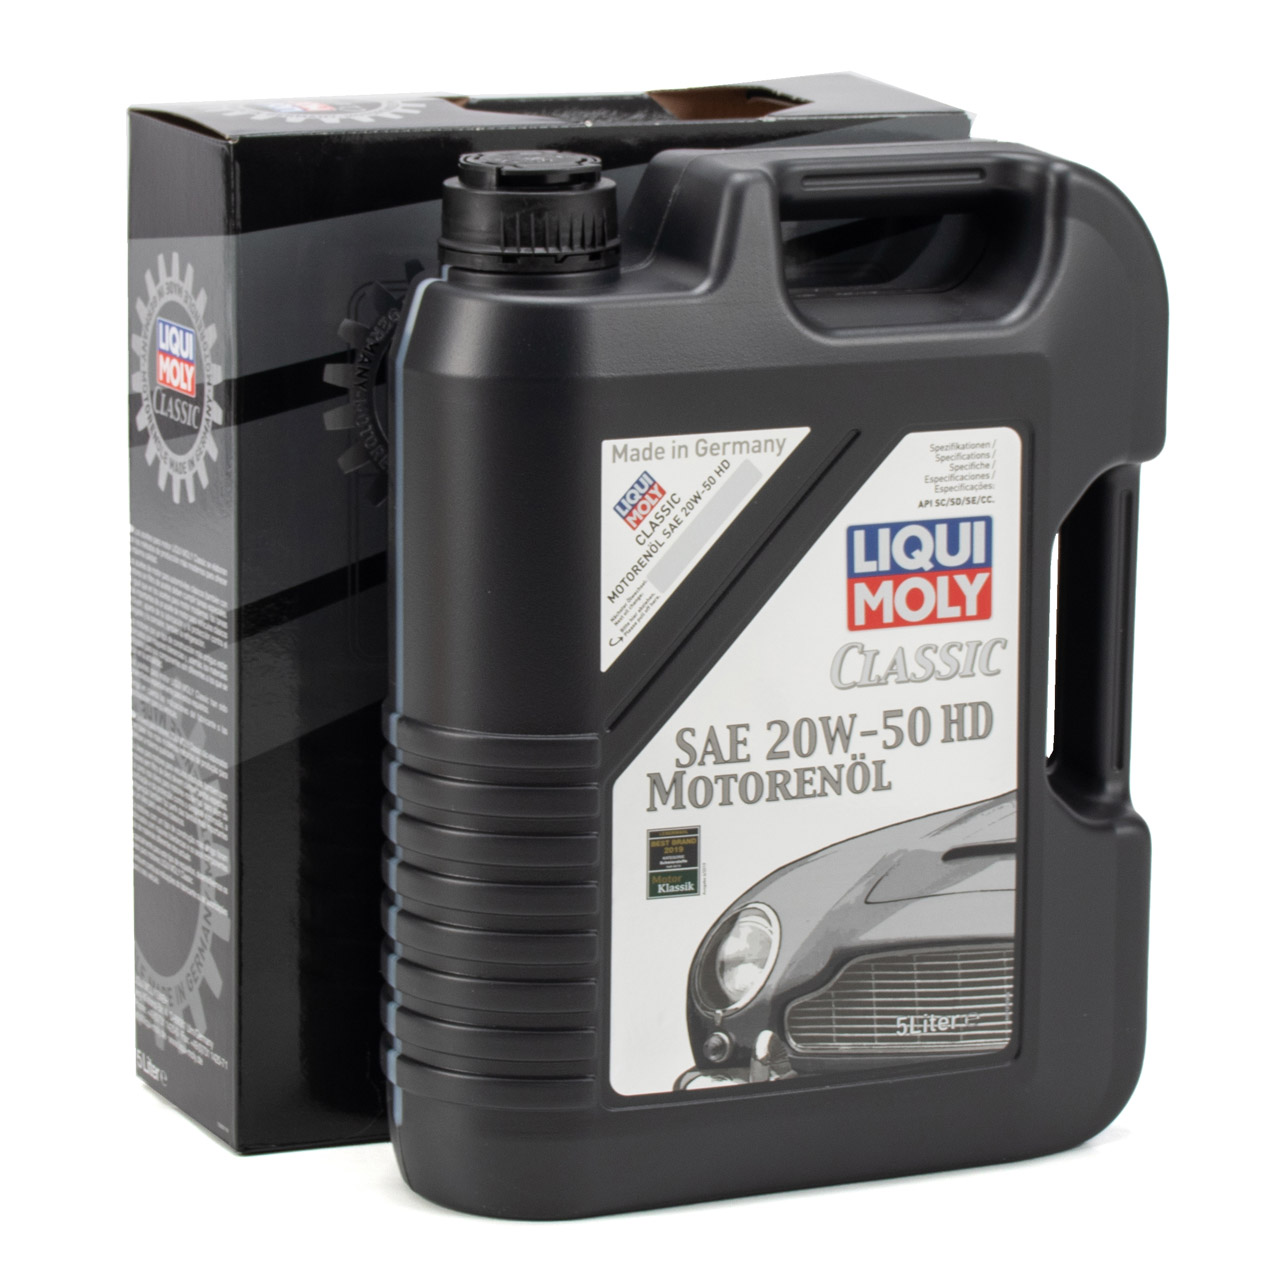 5 Liter 5L LIQUI MOLY Motoröl Öl CLASSIC 20W-50 20W50 HD Oldtimer Youngtimer